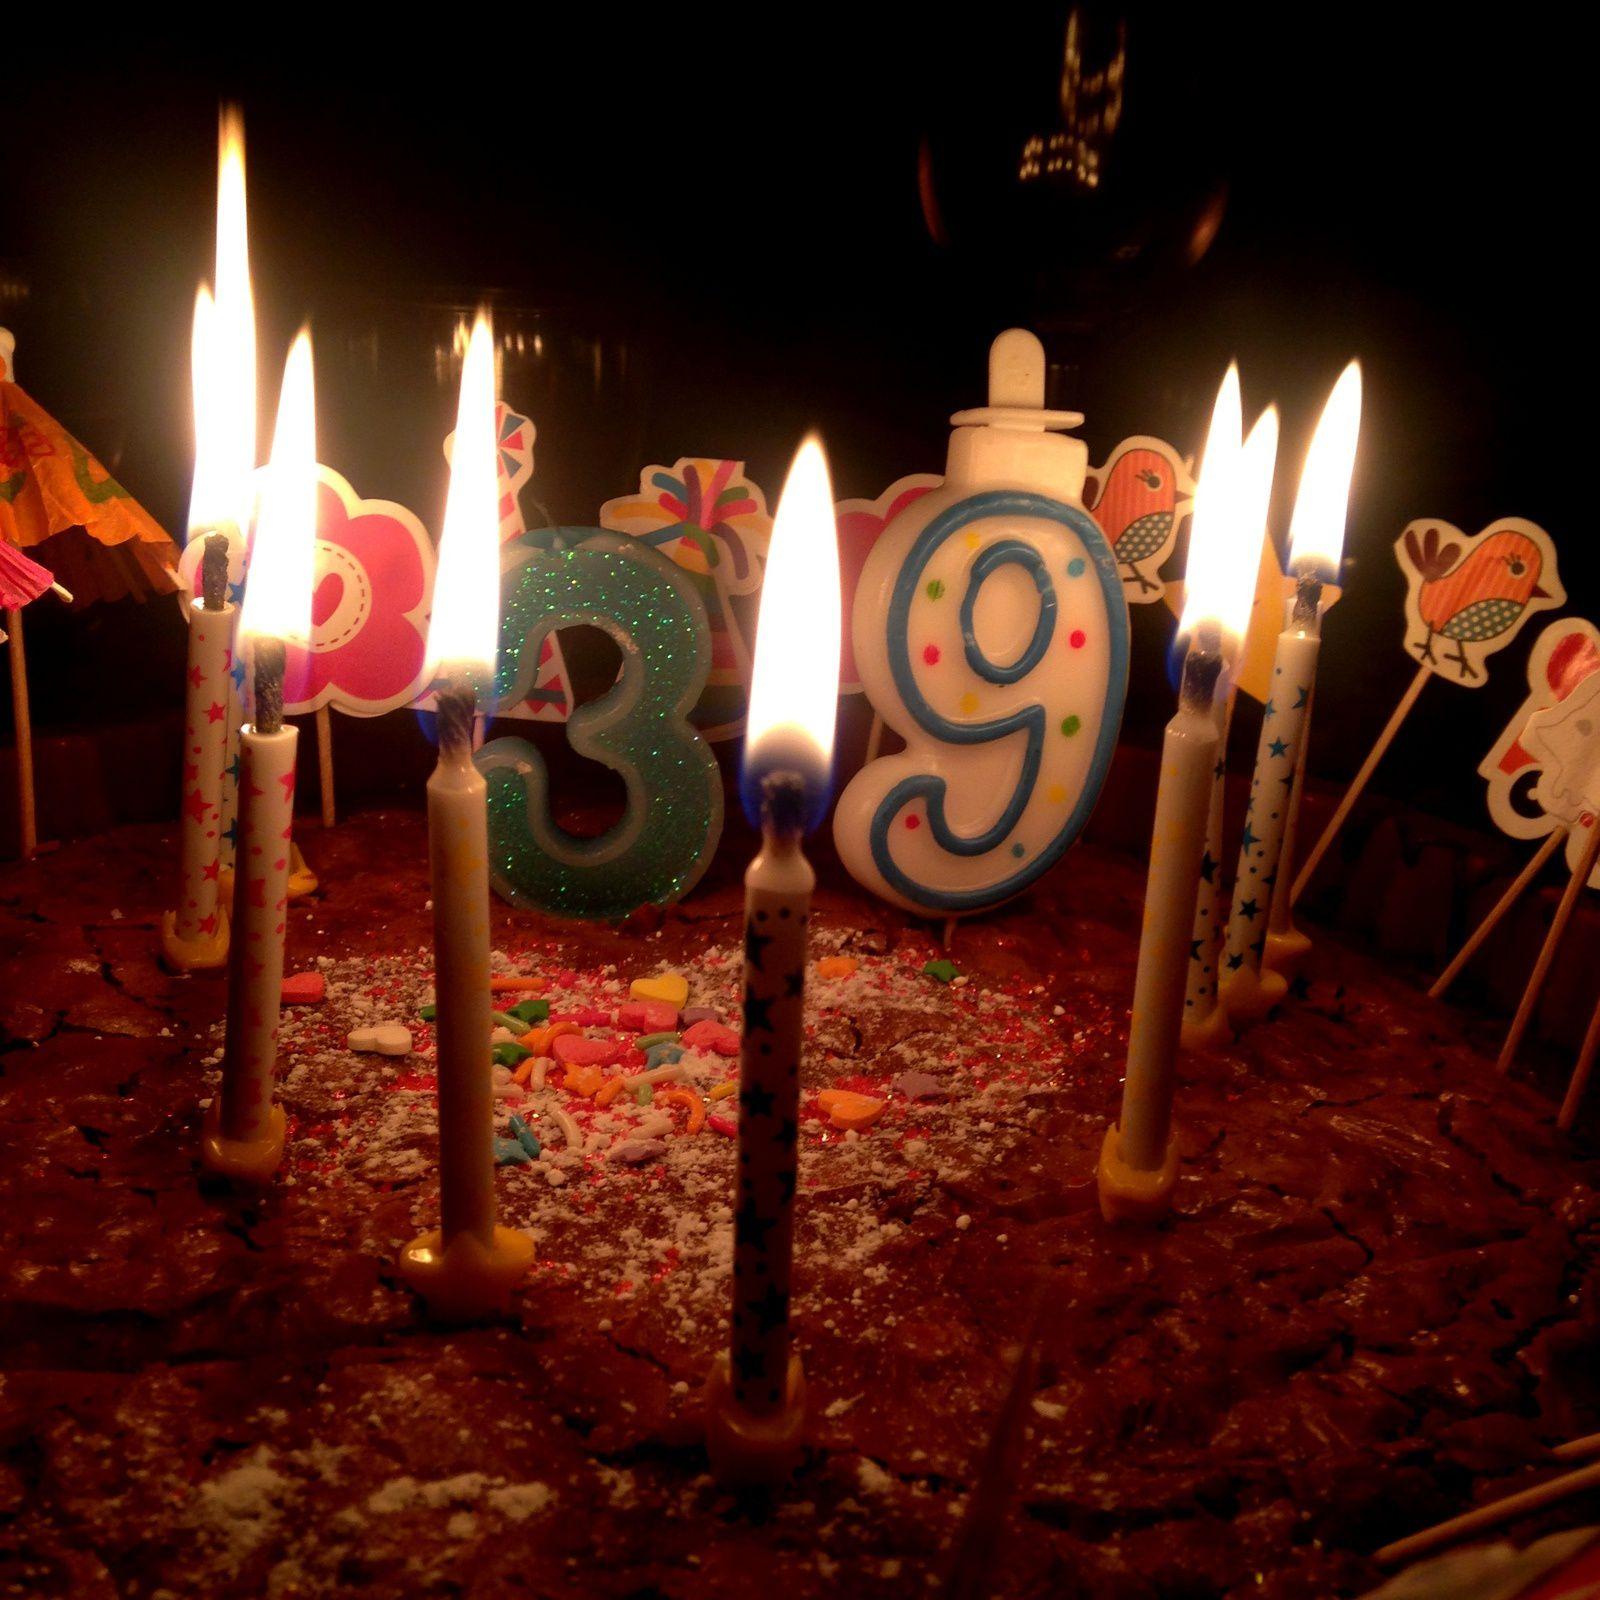 gateau anniversaire - 39 ans- decor enfant- charlotteblabla blog*